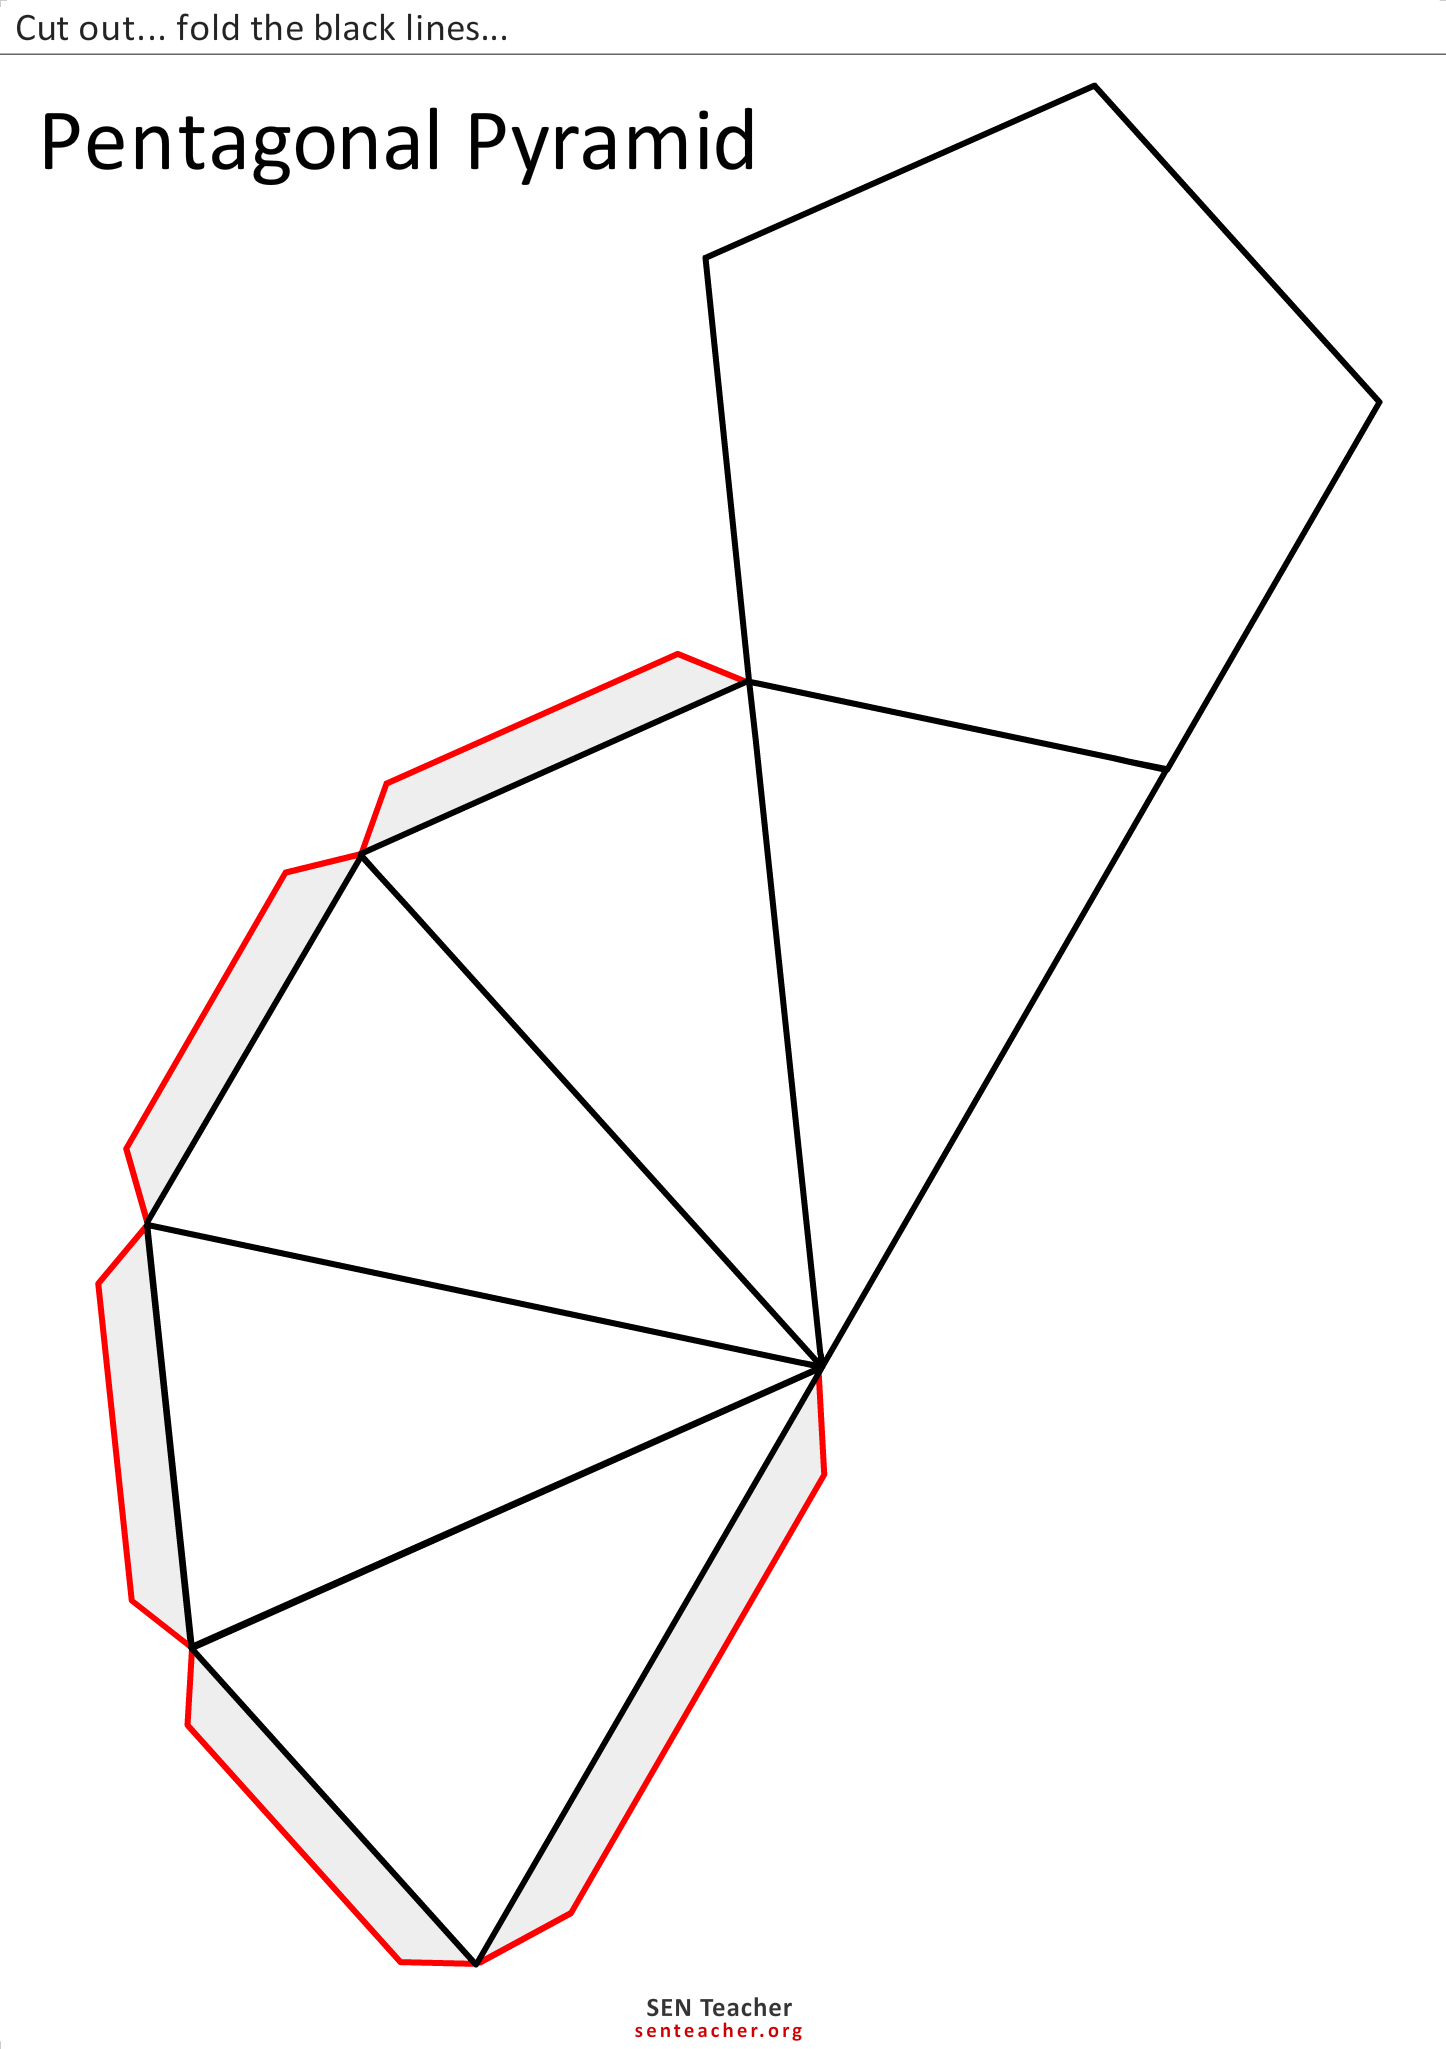 piramide pentagonal para recortar | Diseños | Pinterest | Origami ...